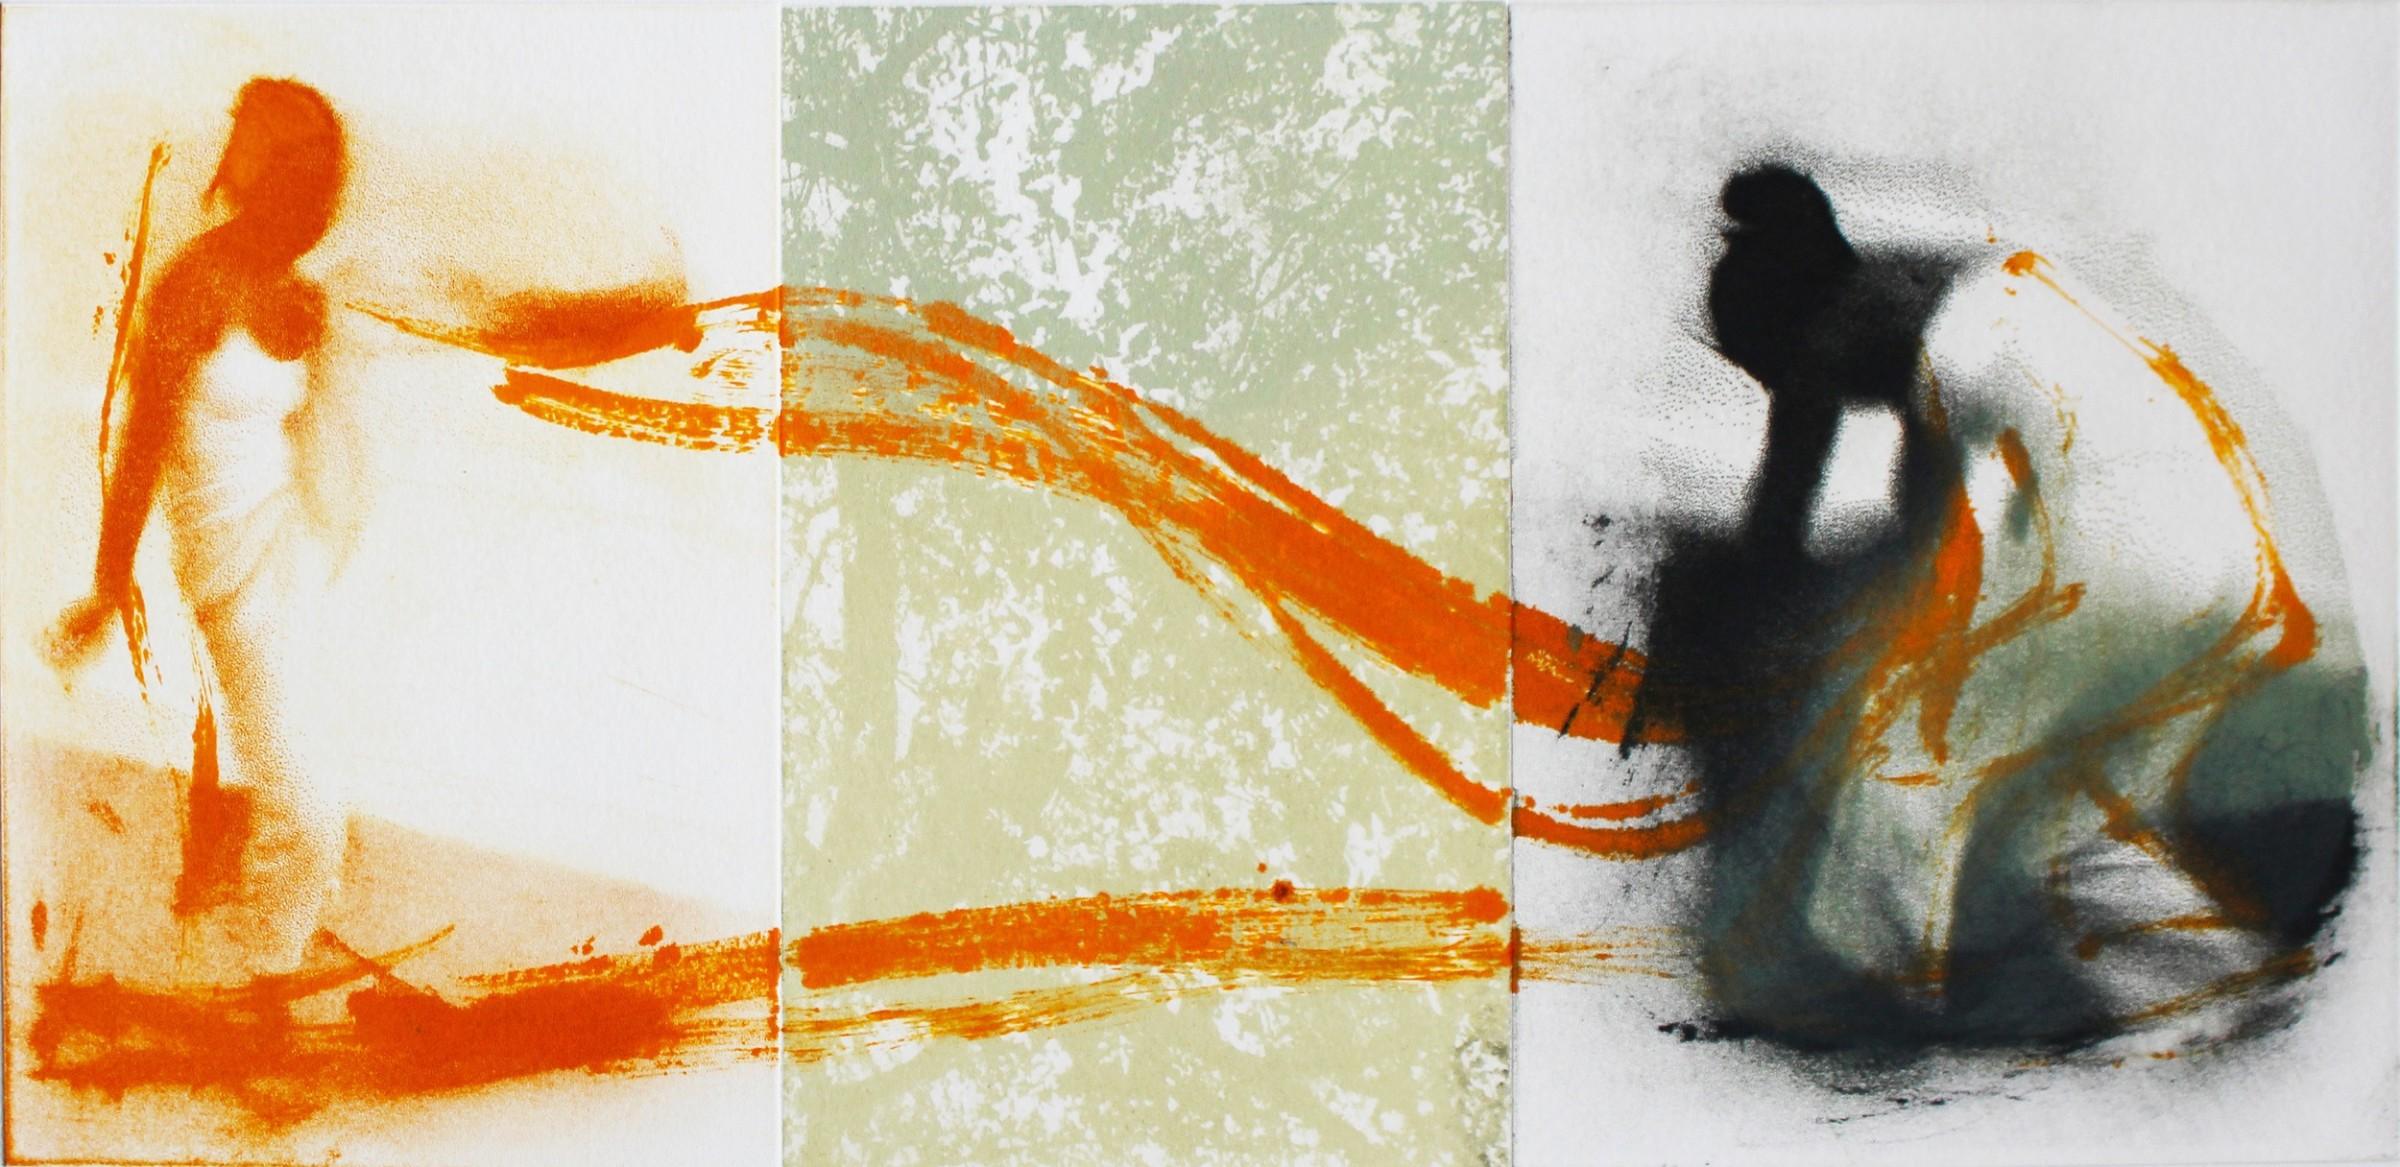 "<span class=""link fancybox-details-link""><a href=""/exhibitions/23/works/artworks_standalone11149/"">View Detail Page</a></span><div class=""artist""><span class=""artist""><strong>Margaret Ashman RE</strong></span></div><div class=""title""><em>Ebb and Flow</em></div><div class=""medium"">photo etching & monotype</div><div class=""dimensions"">28 x 50 cm paper size<br>17.5 x 37.5 cm image size</div><div class=""edition_details"">edition of 100</div>"